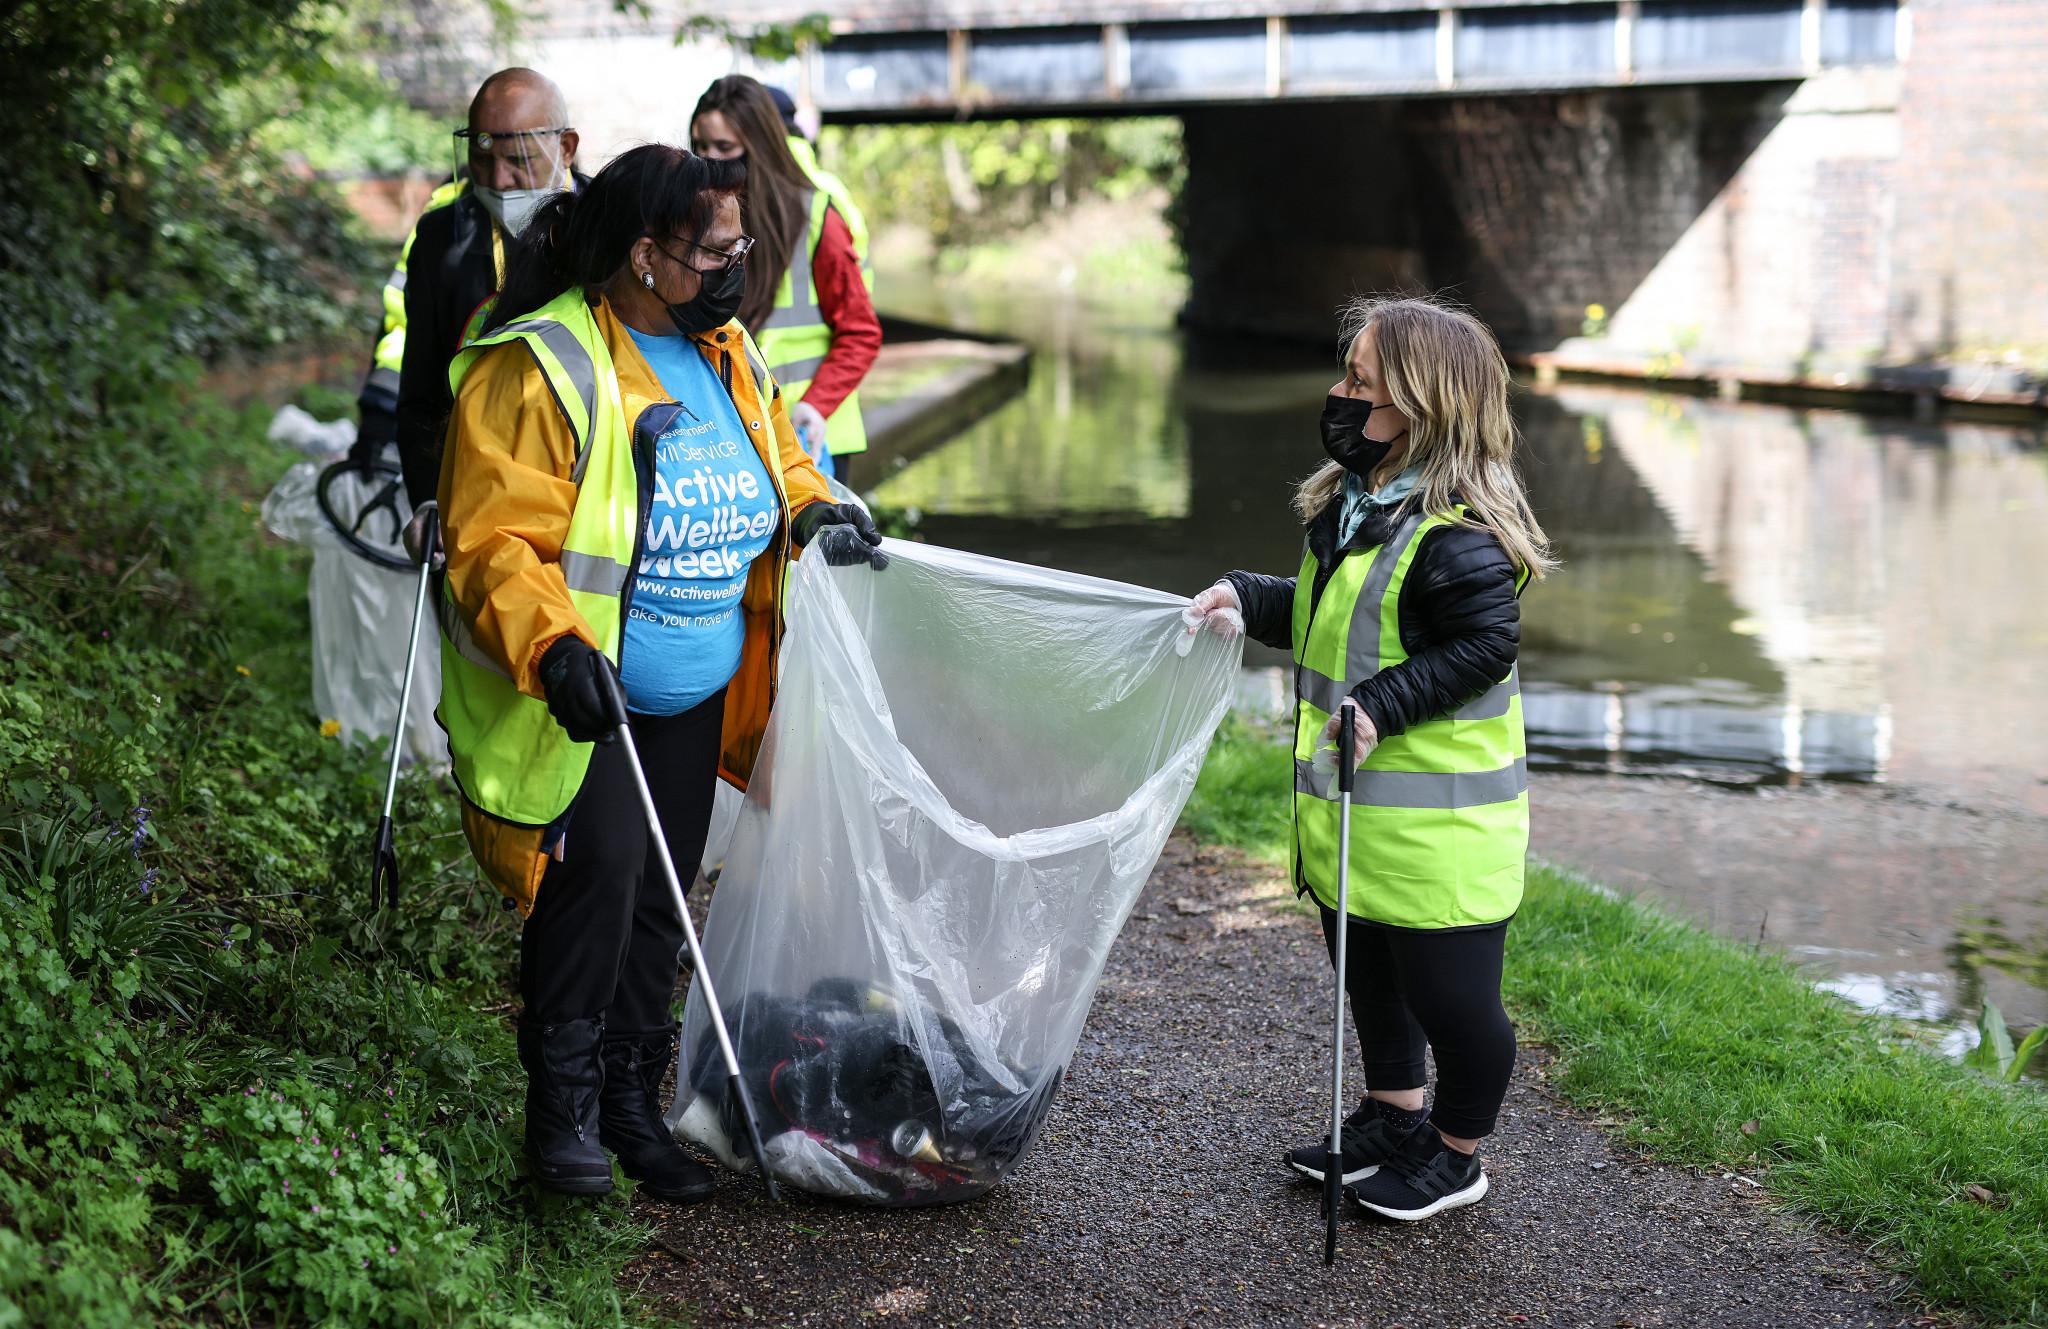 Ellie Simmonds volunteered to help clean up Walsall's canals ©Birmingham 2022